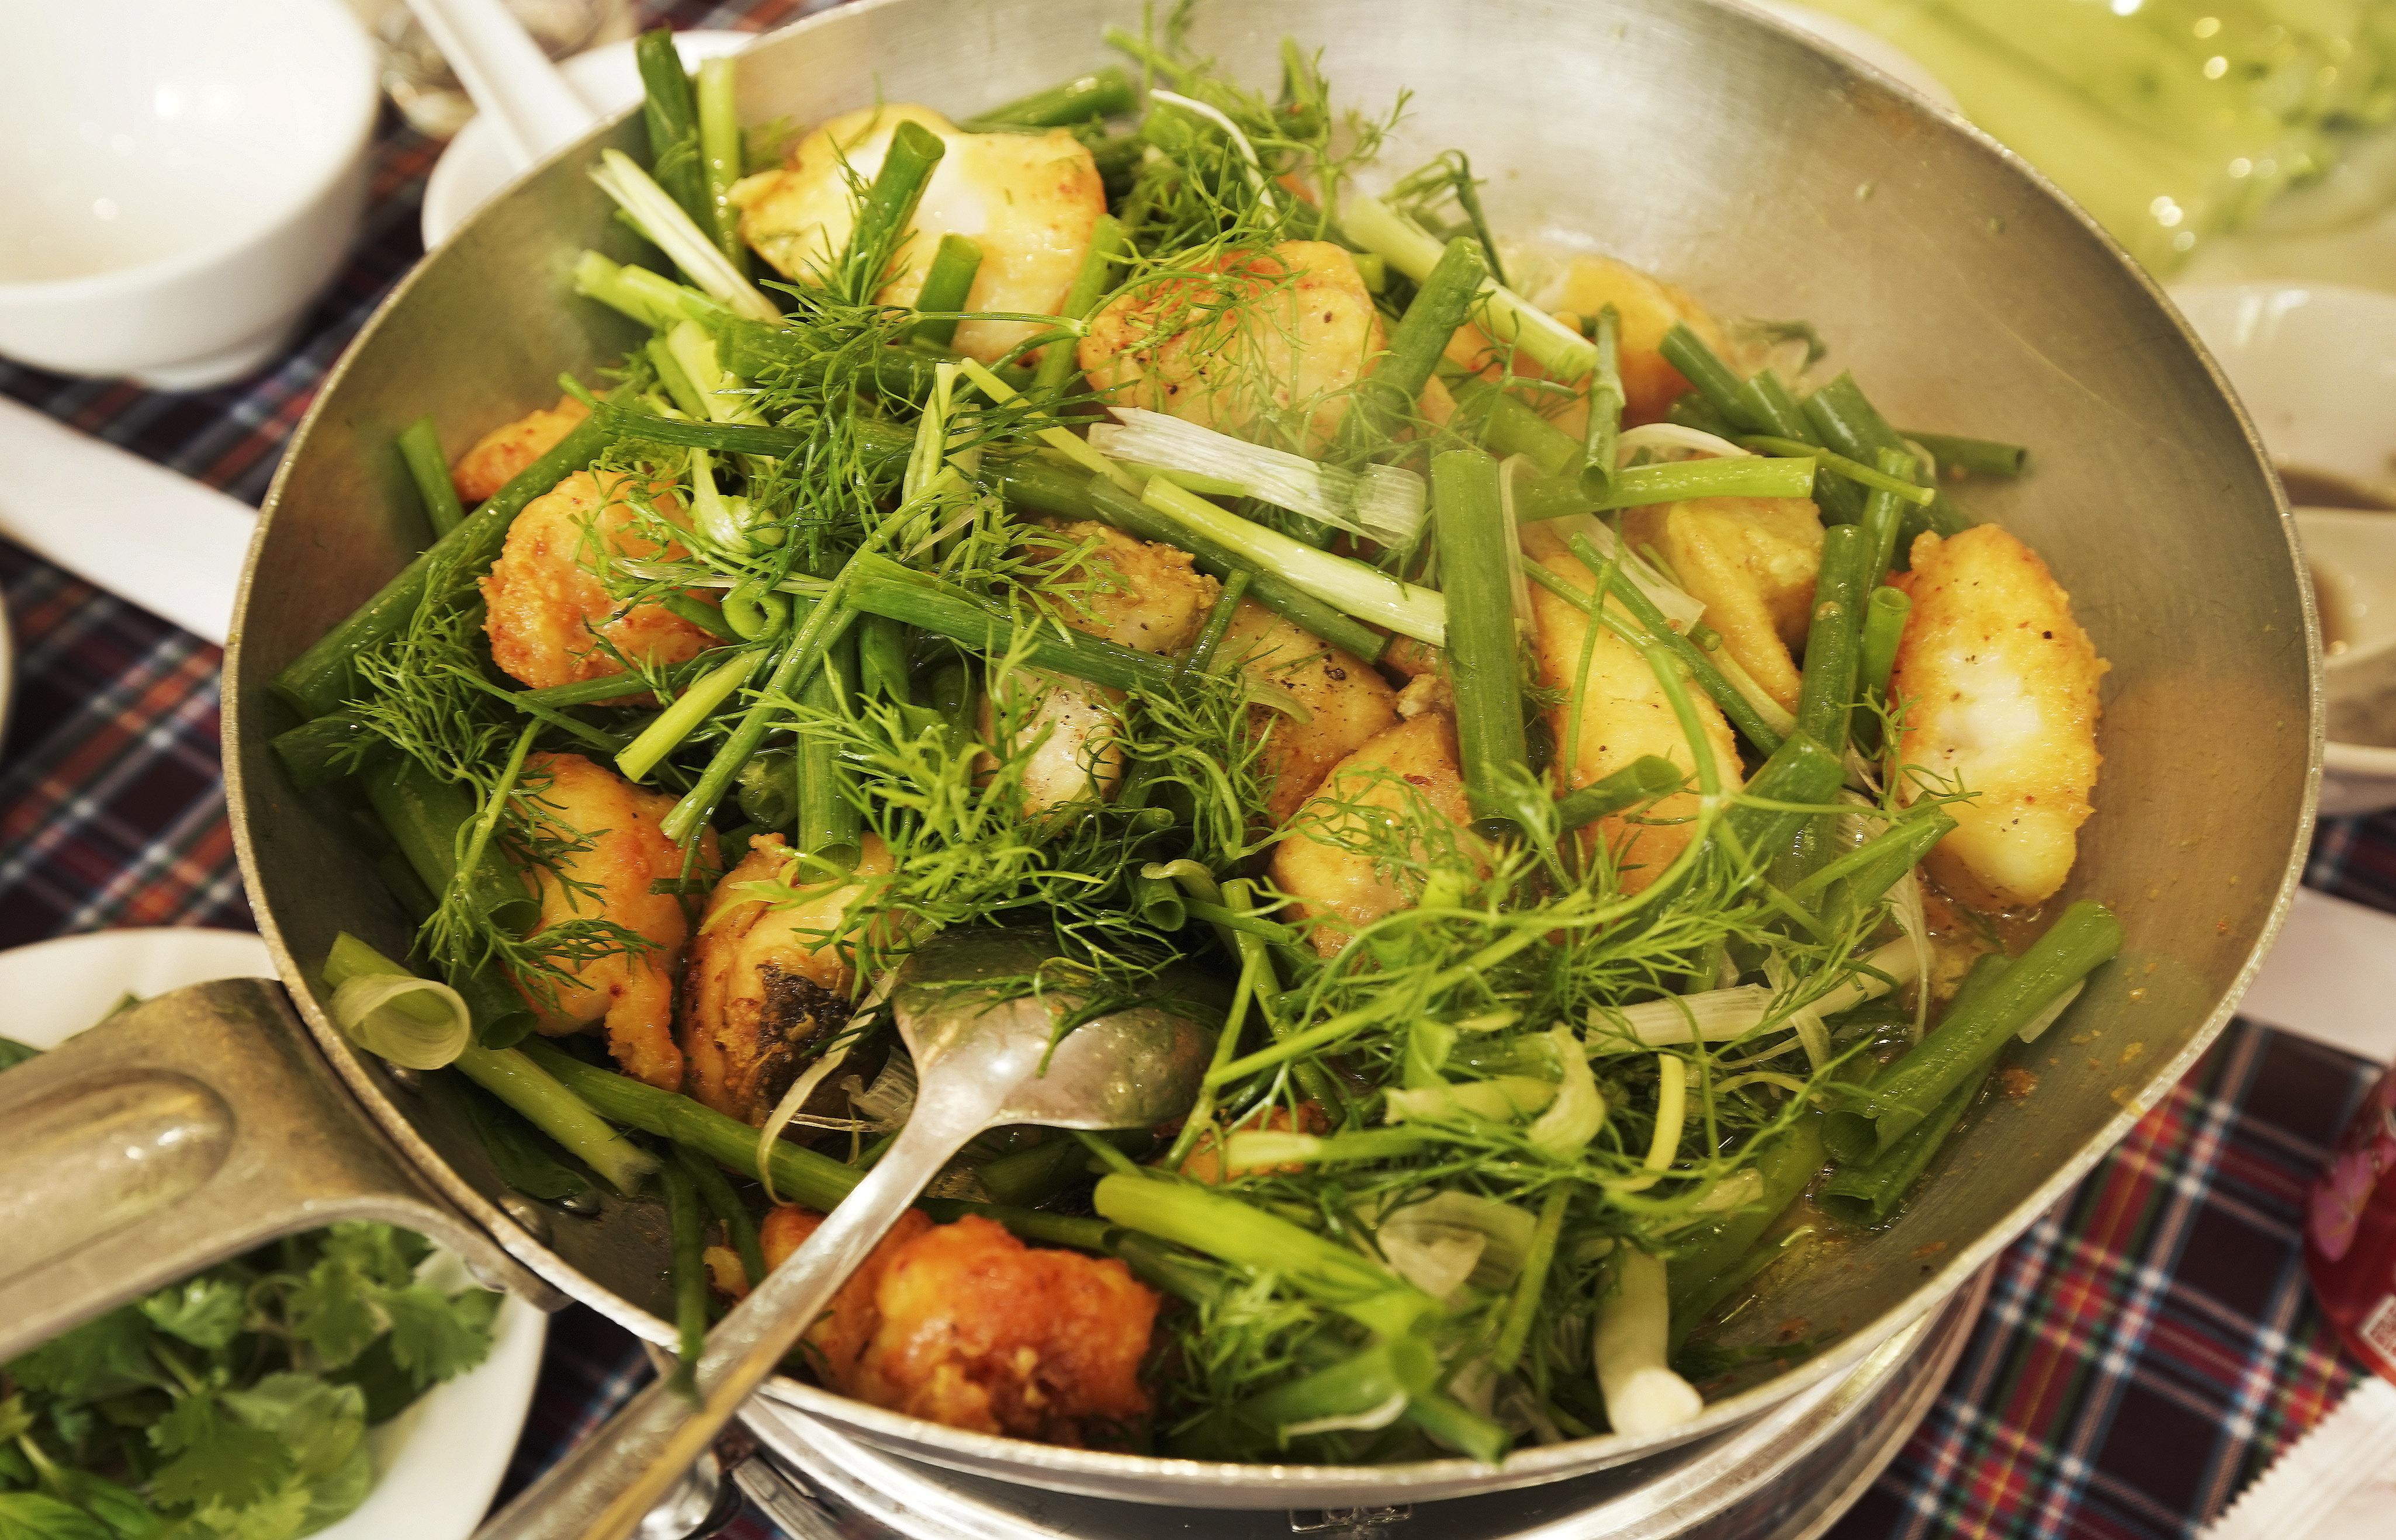 Catfish is prepared in a restaurant in Hanoi, Vietnam, on Saturday, Nov. 16, 2019.